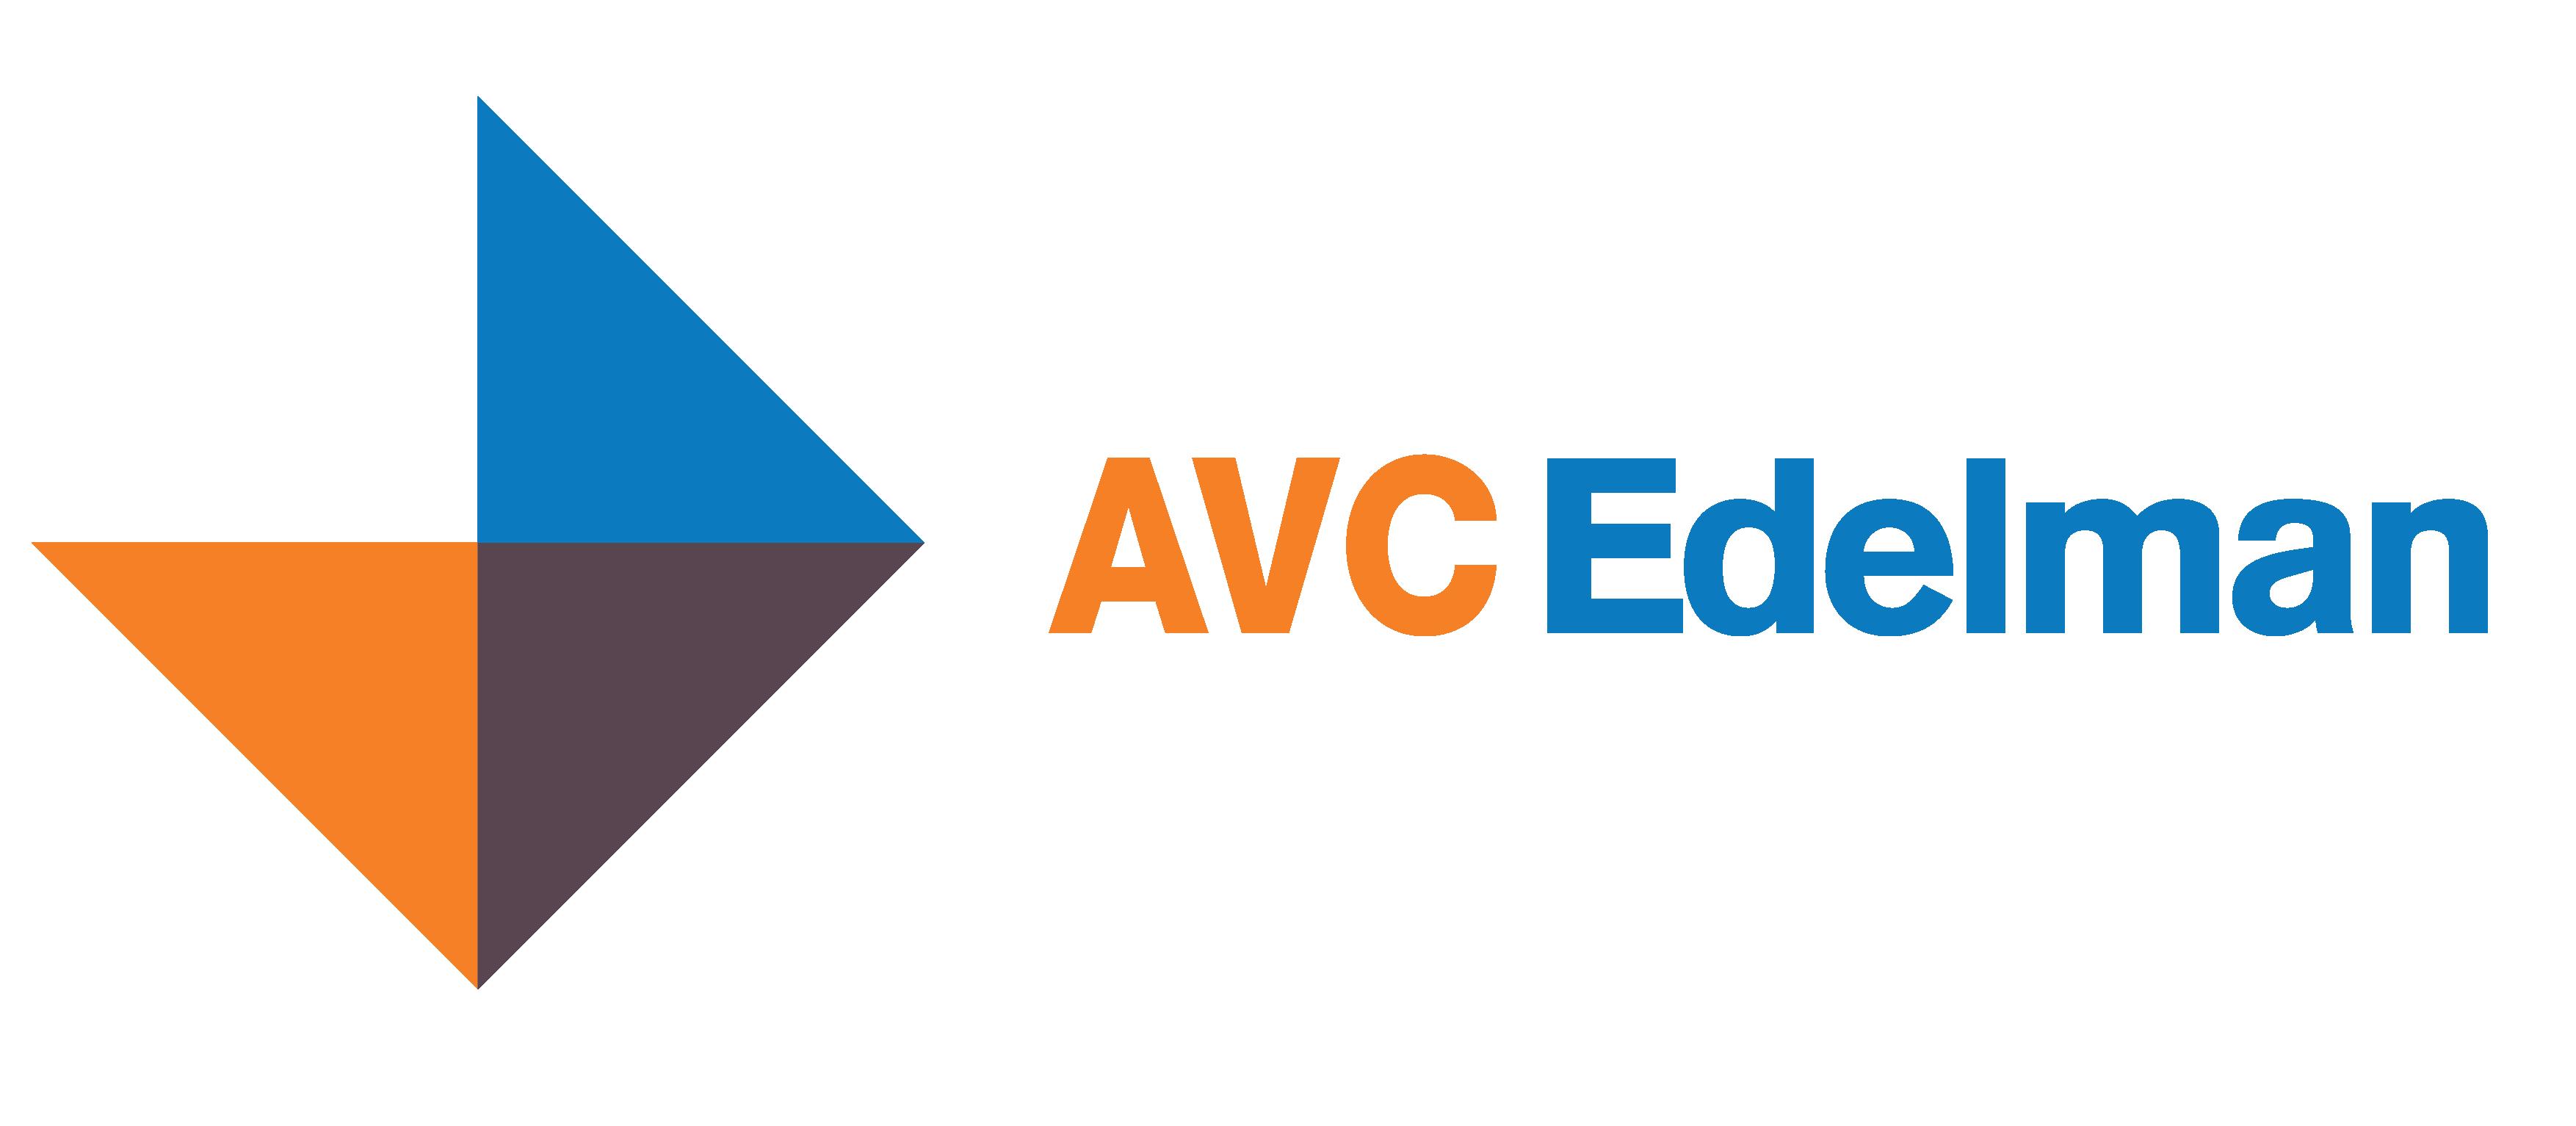 AVC EDELMAN COMPANY